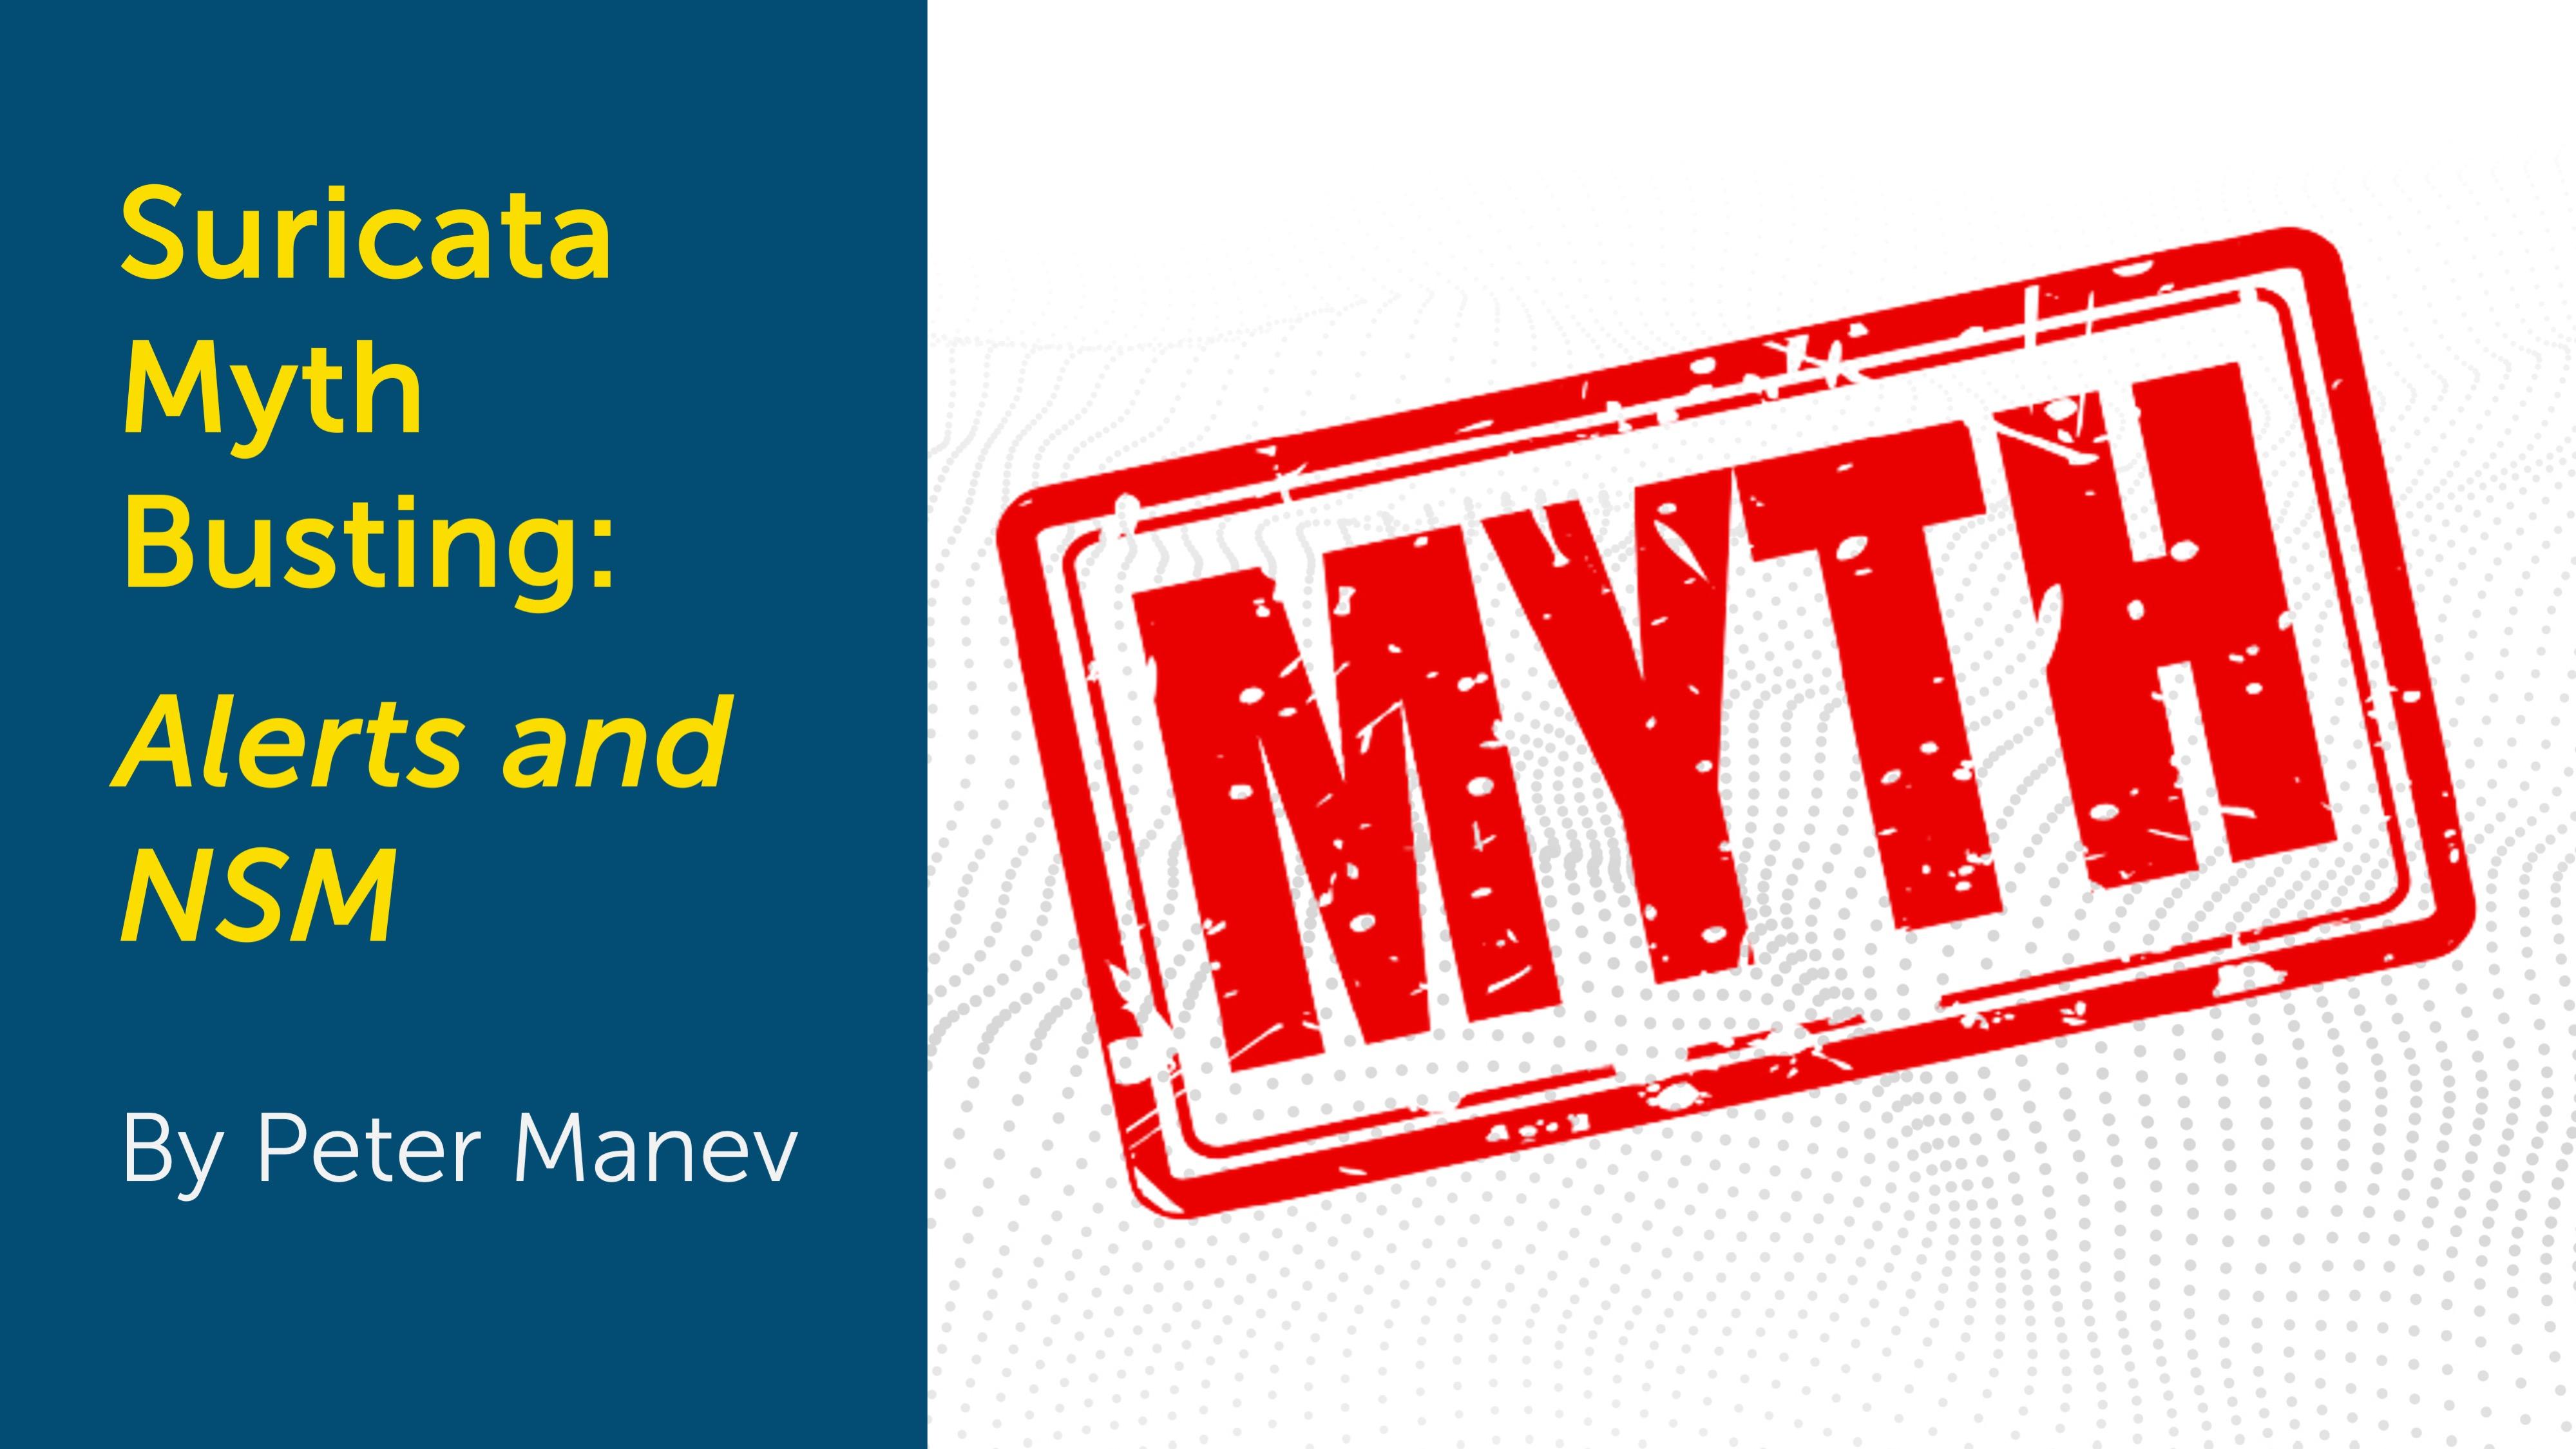 IMAGE: Suricata Myth Busting: Alerts and NSM